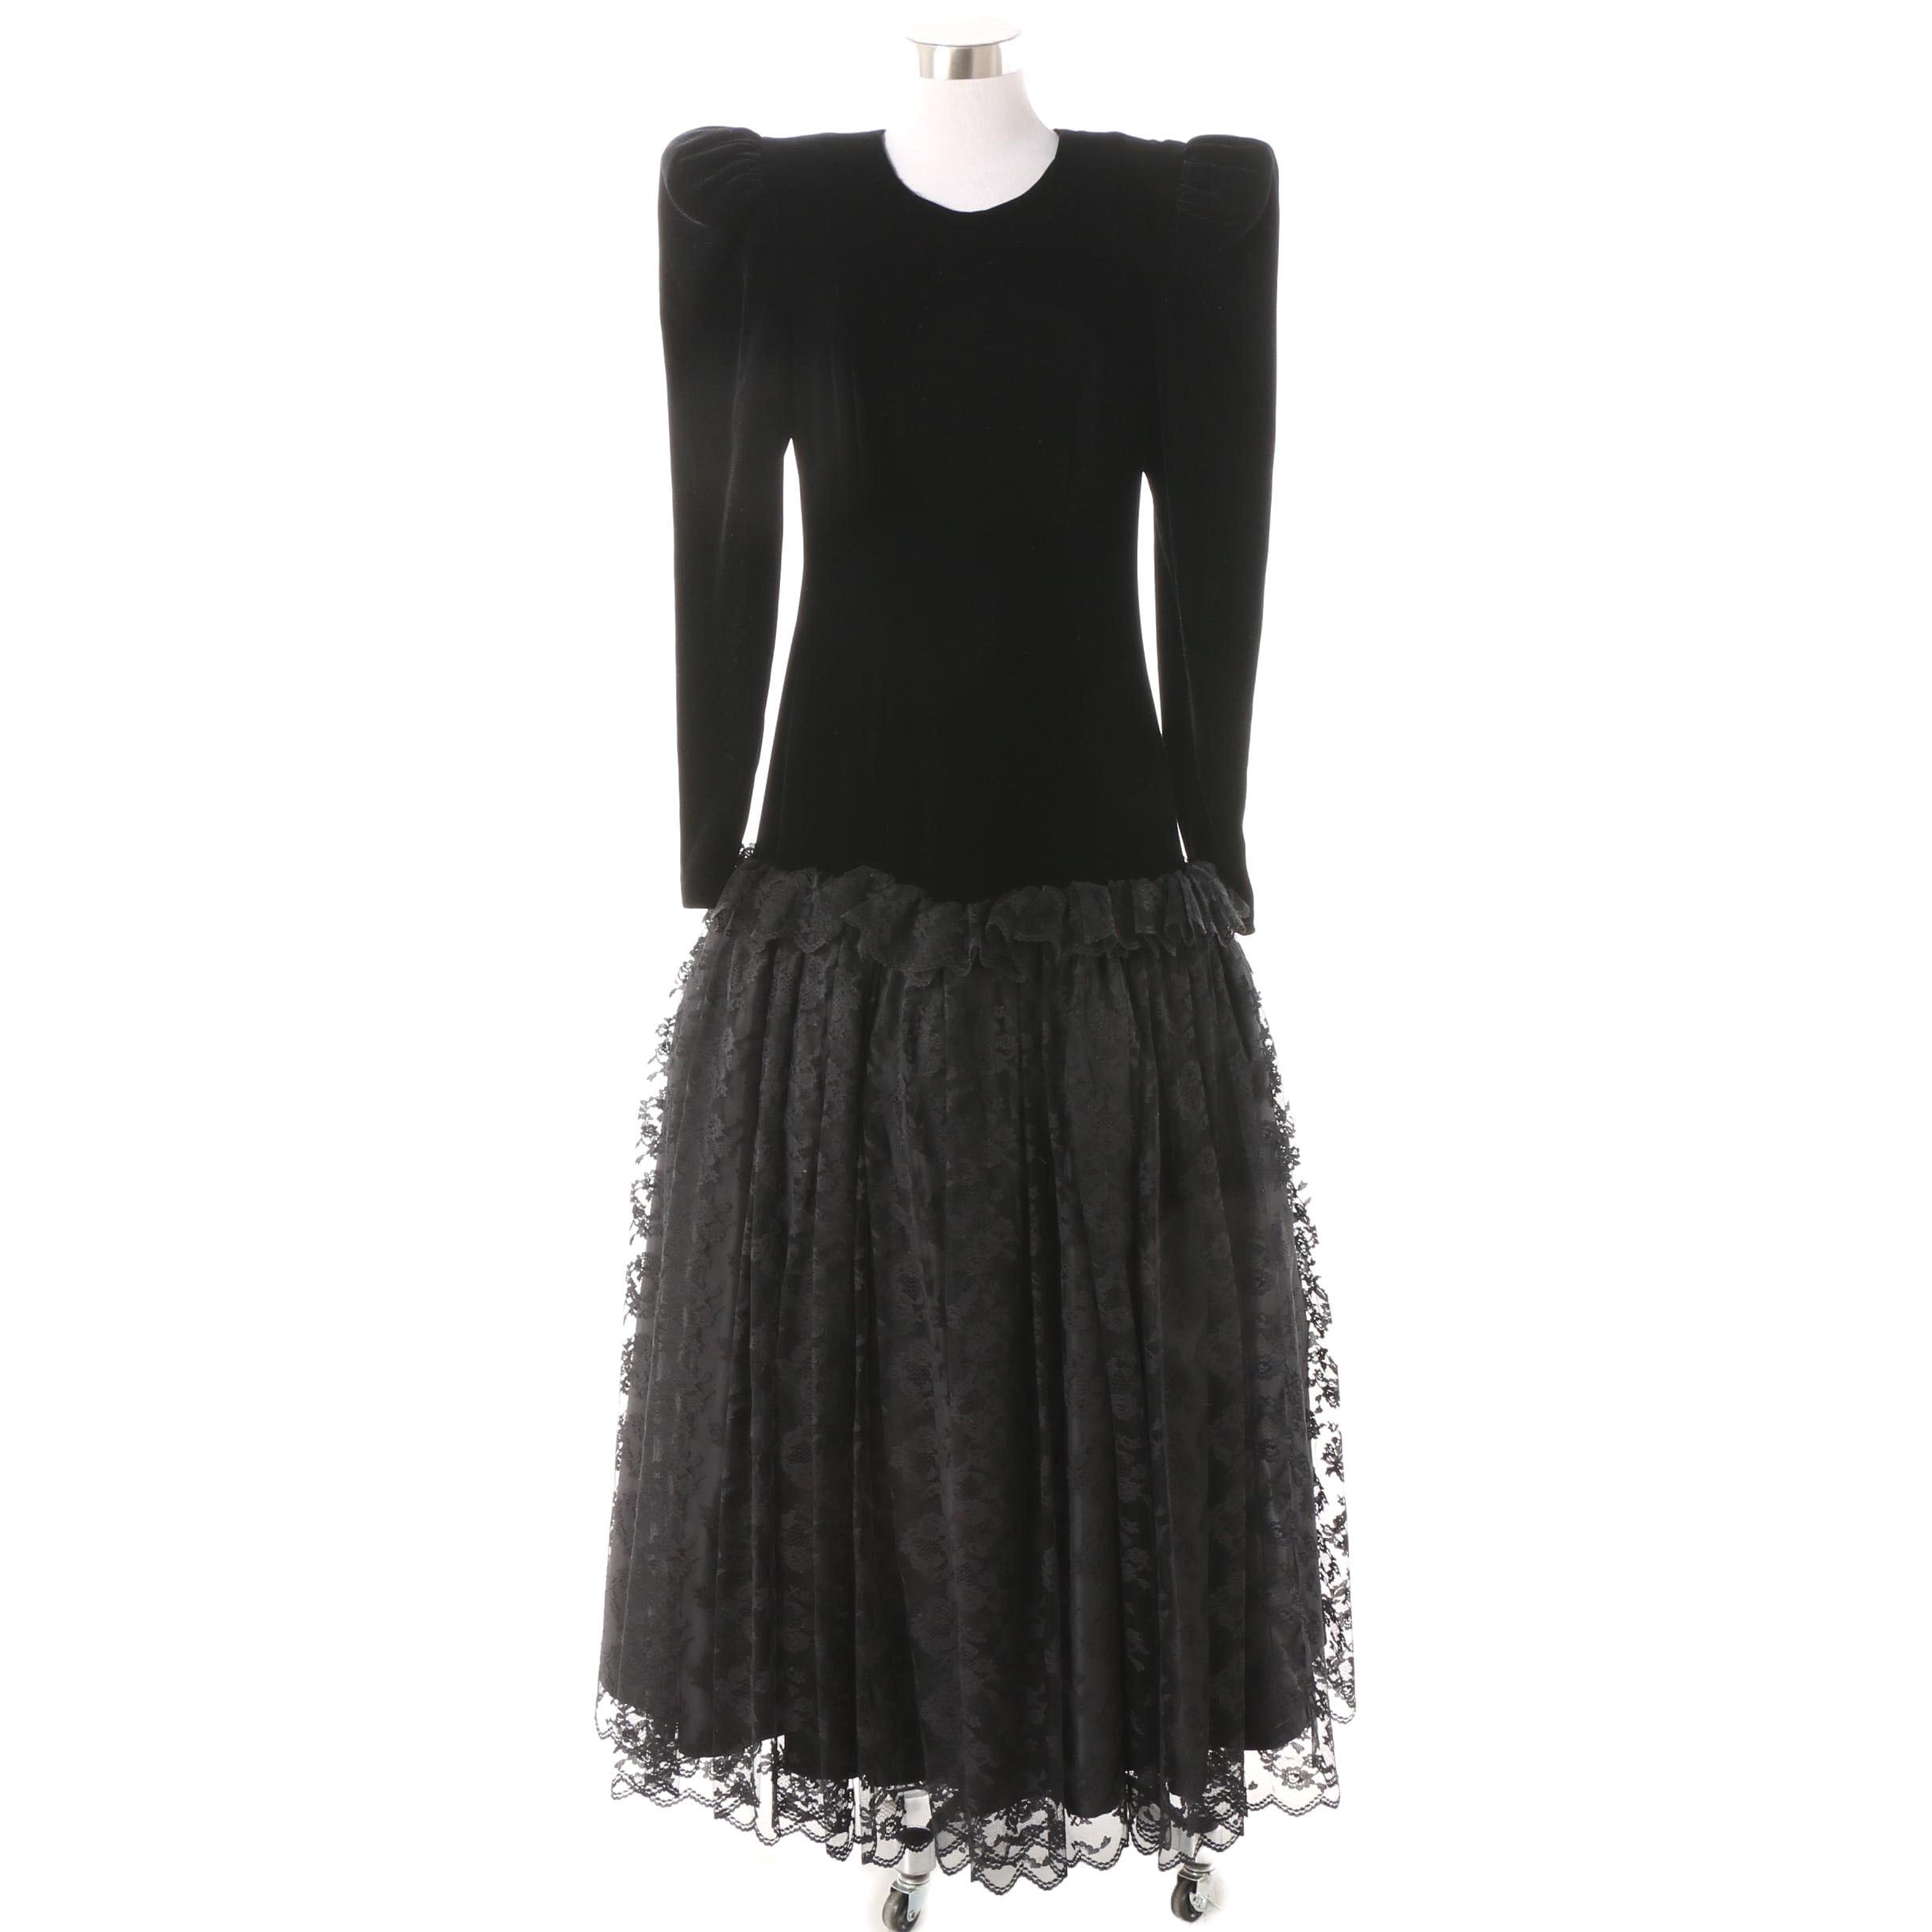 Circa 1980s Wayne Clark Black Velvet and Lace Drop Waist Evening Gown